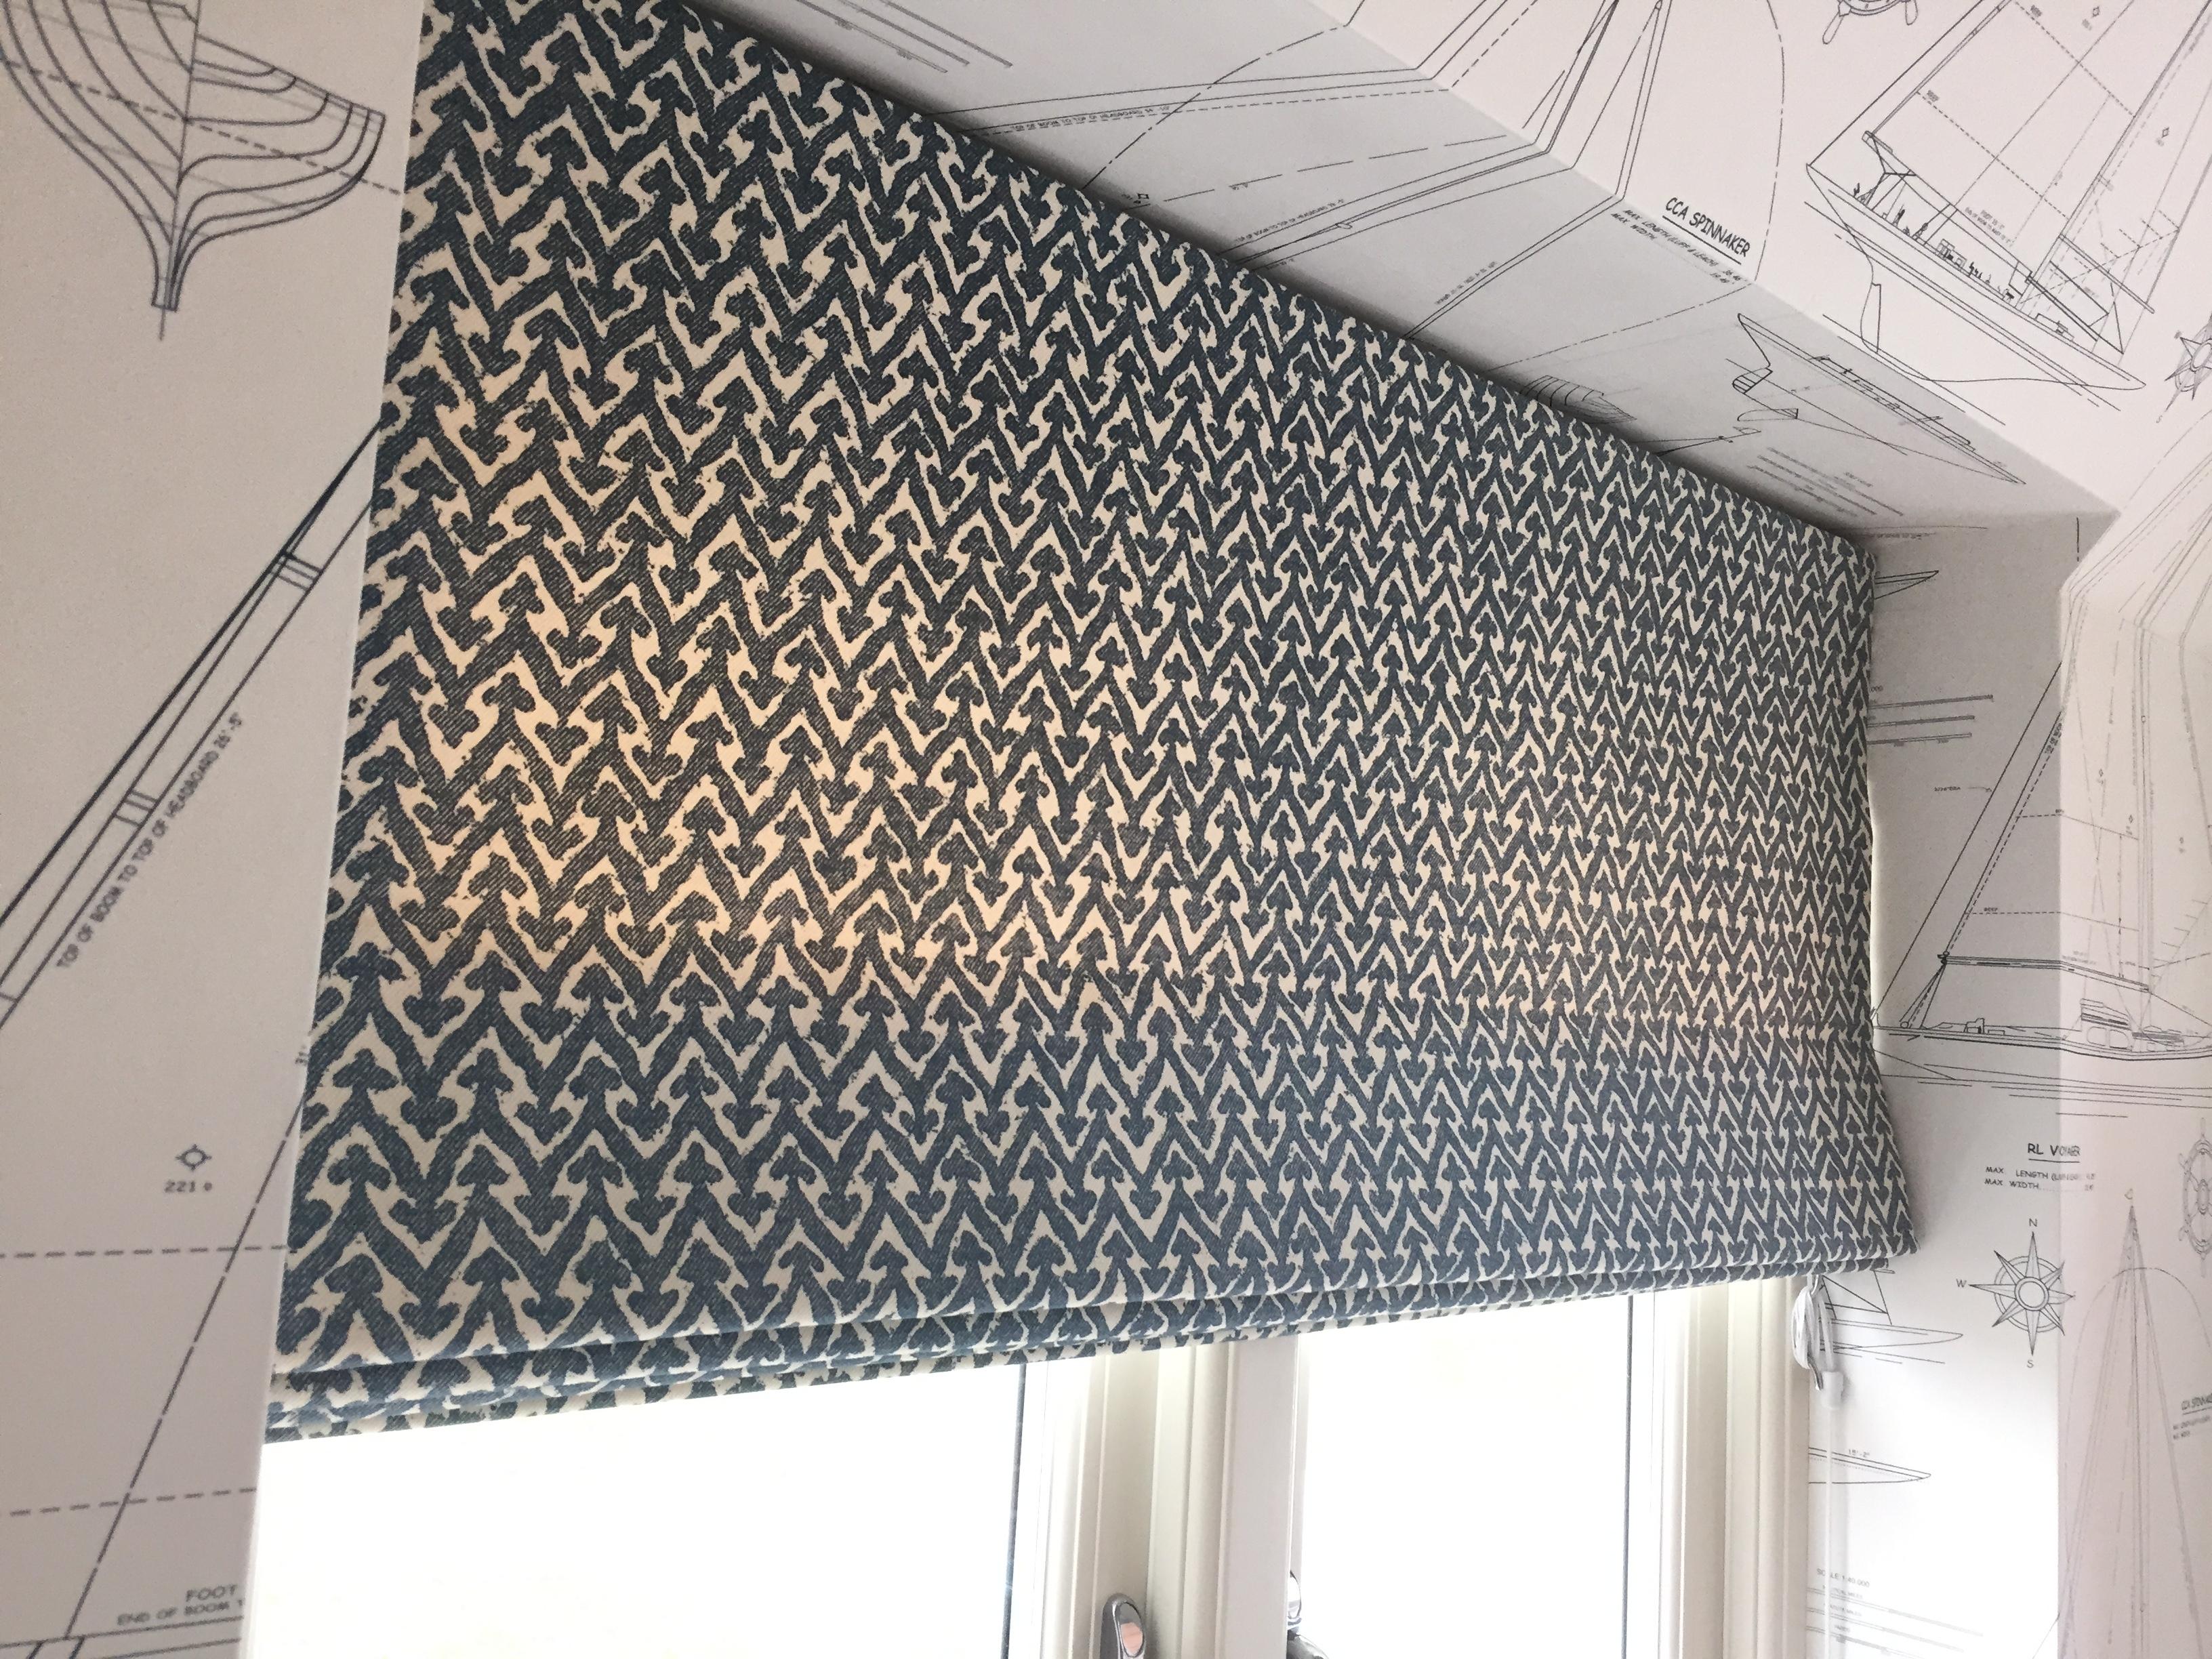 Handmade Roman Blind Victoria Clark Interiors Fabric Ian Inside Handmade Roman Blinds (Image 4 of 15)